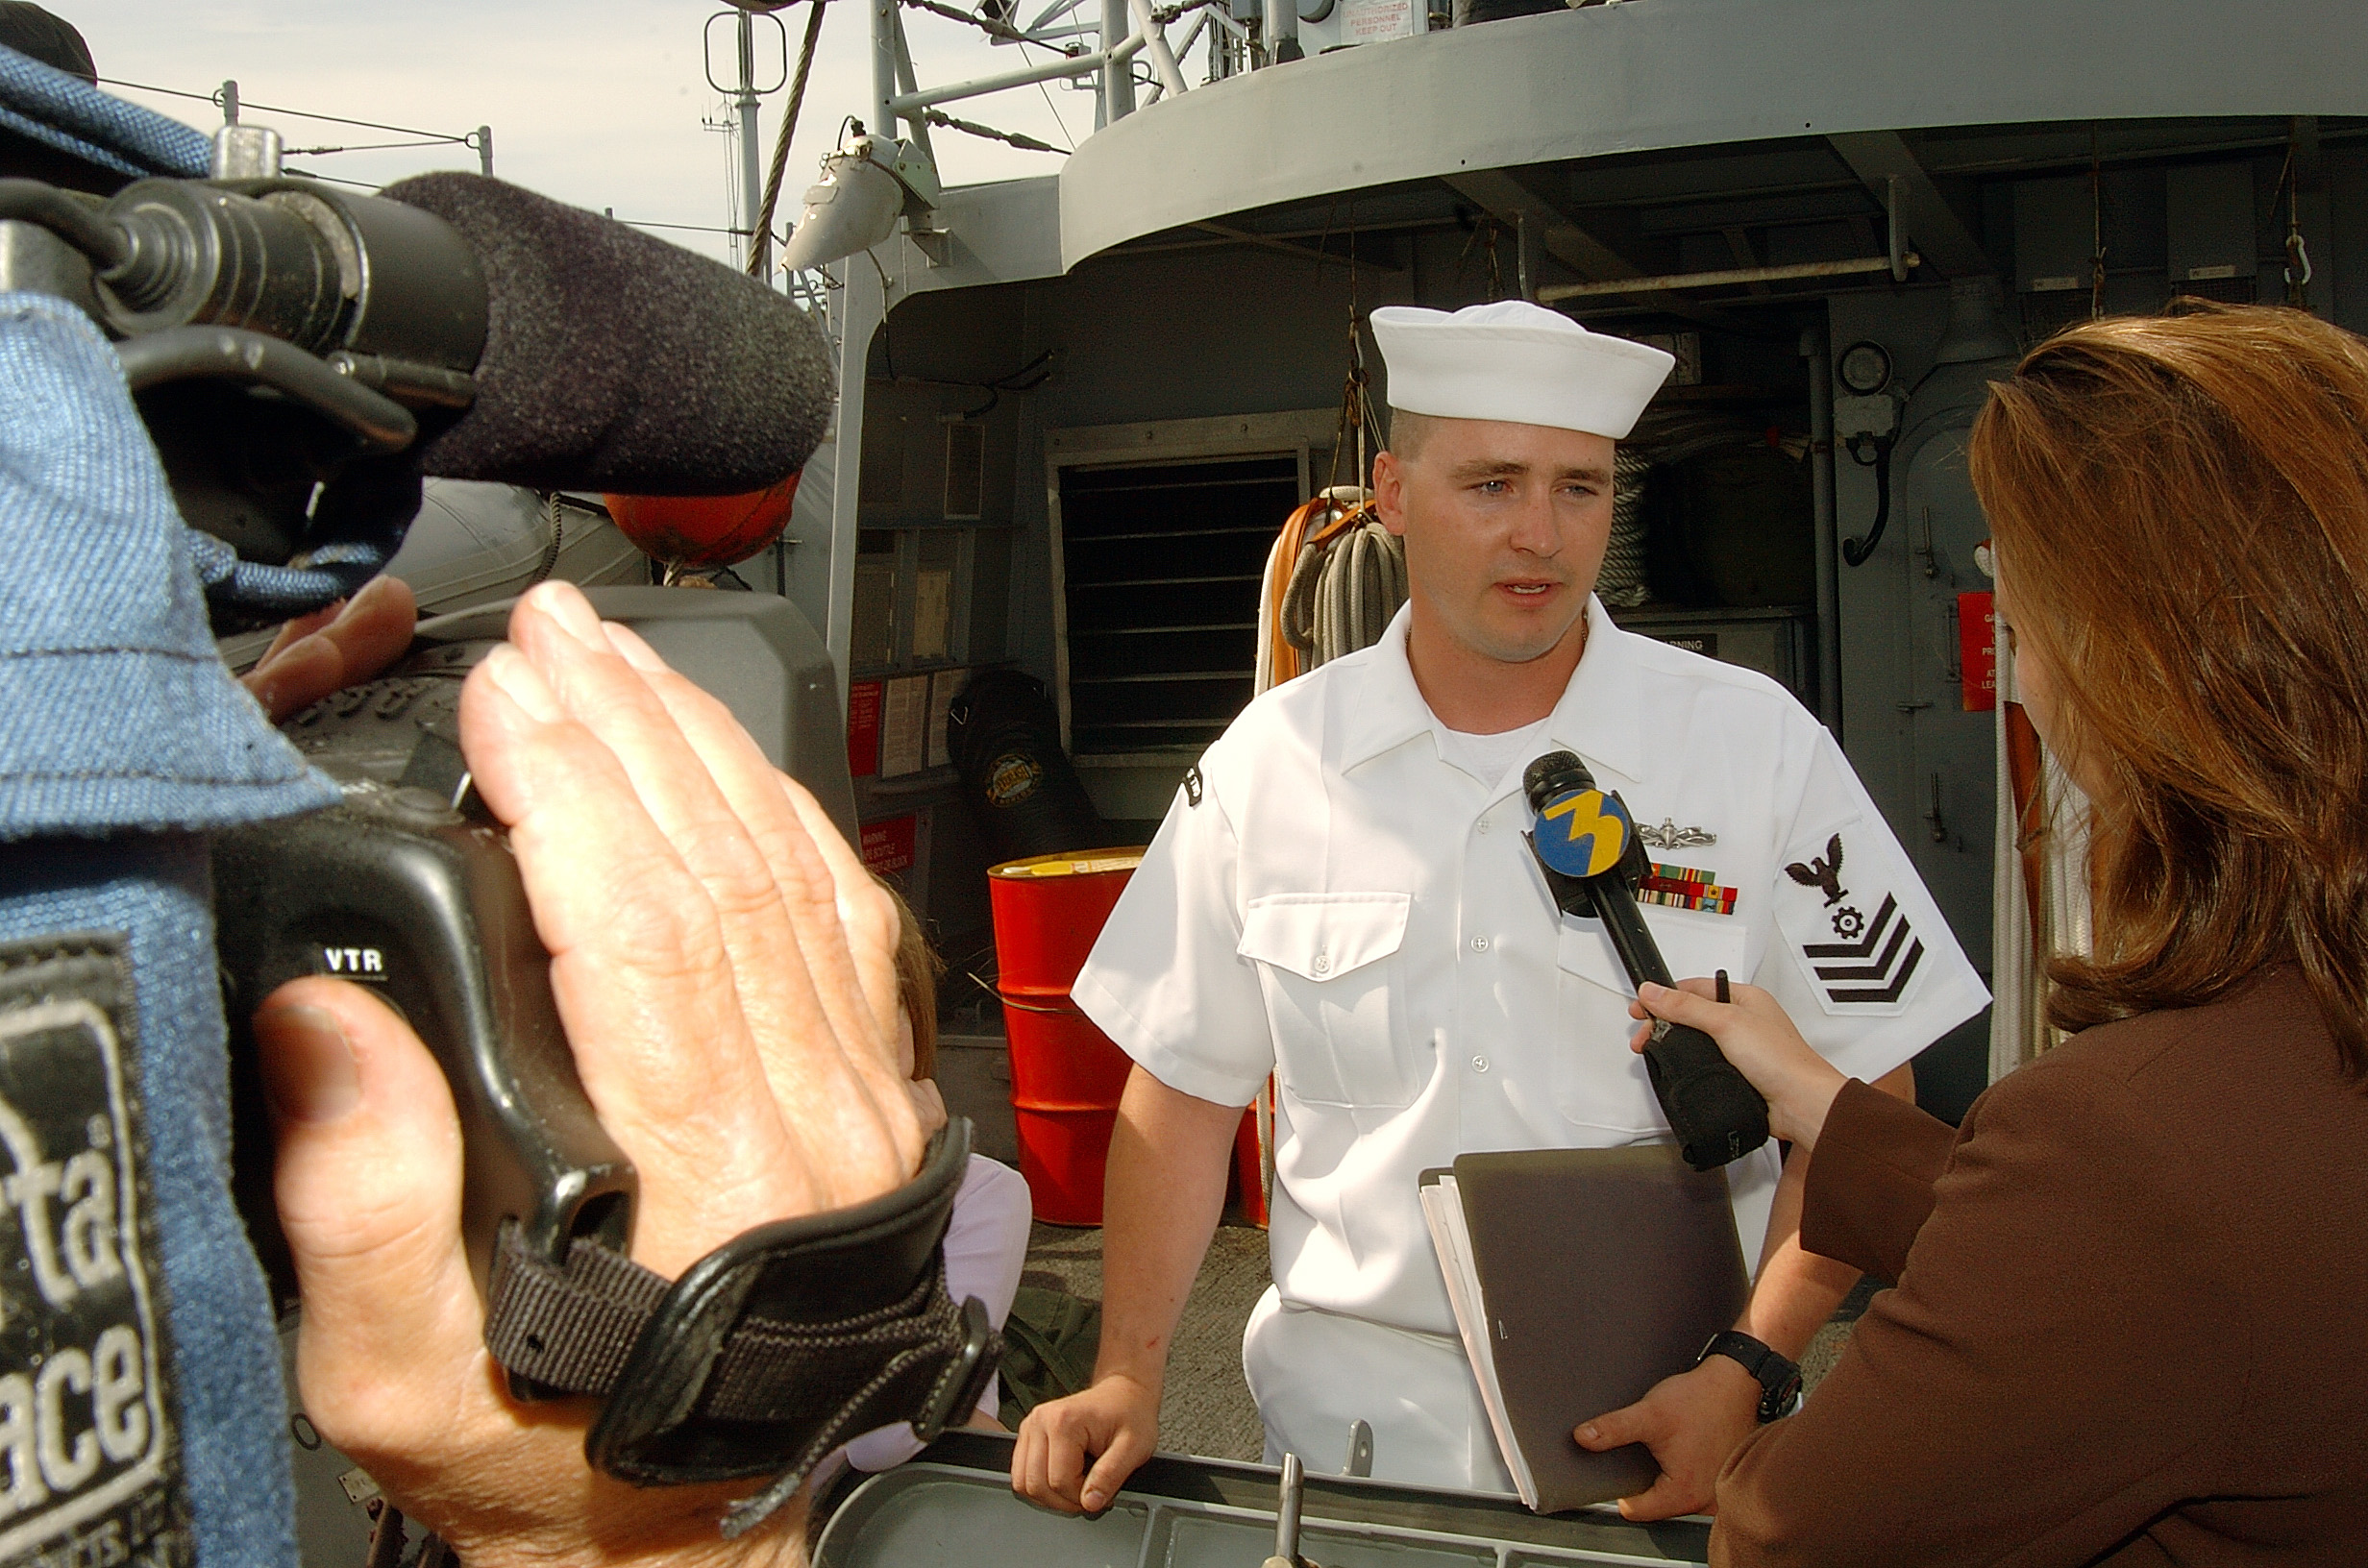 File:US Navy 040430-N-1464F-002 Engineman 1st Class William